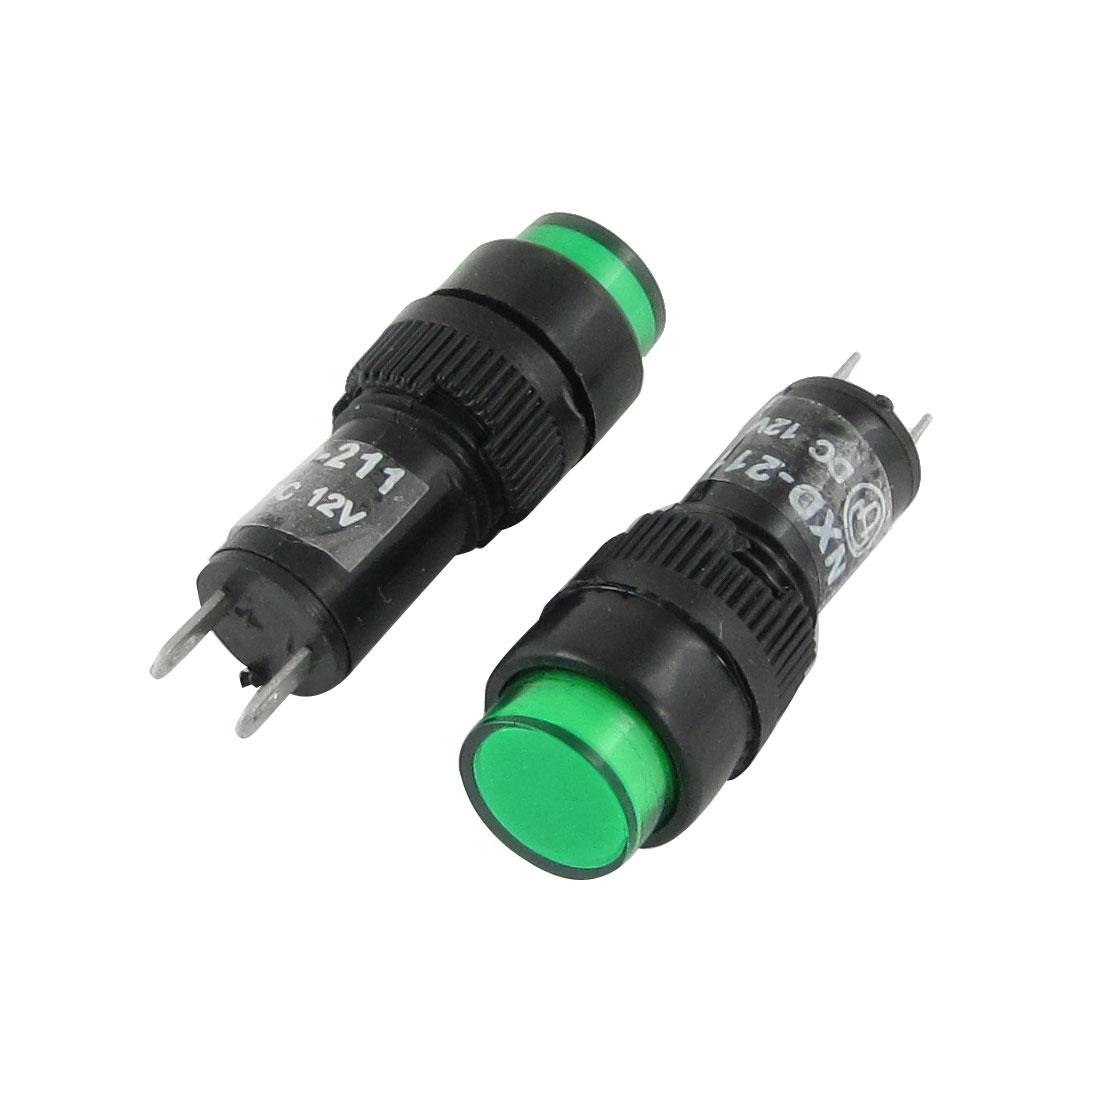 Unique Bargains 10pcs 10mm Neon Indicator Pilot Signal Light Lamp DC12V Green